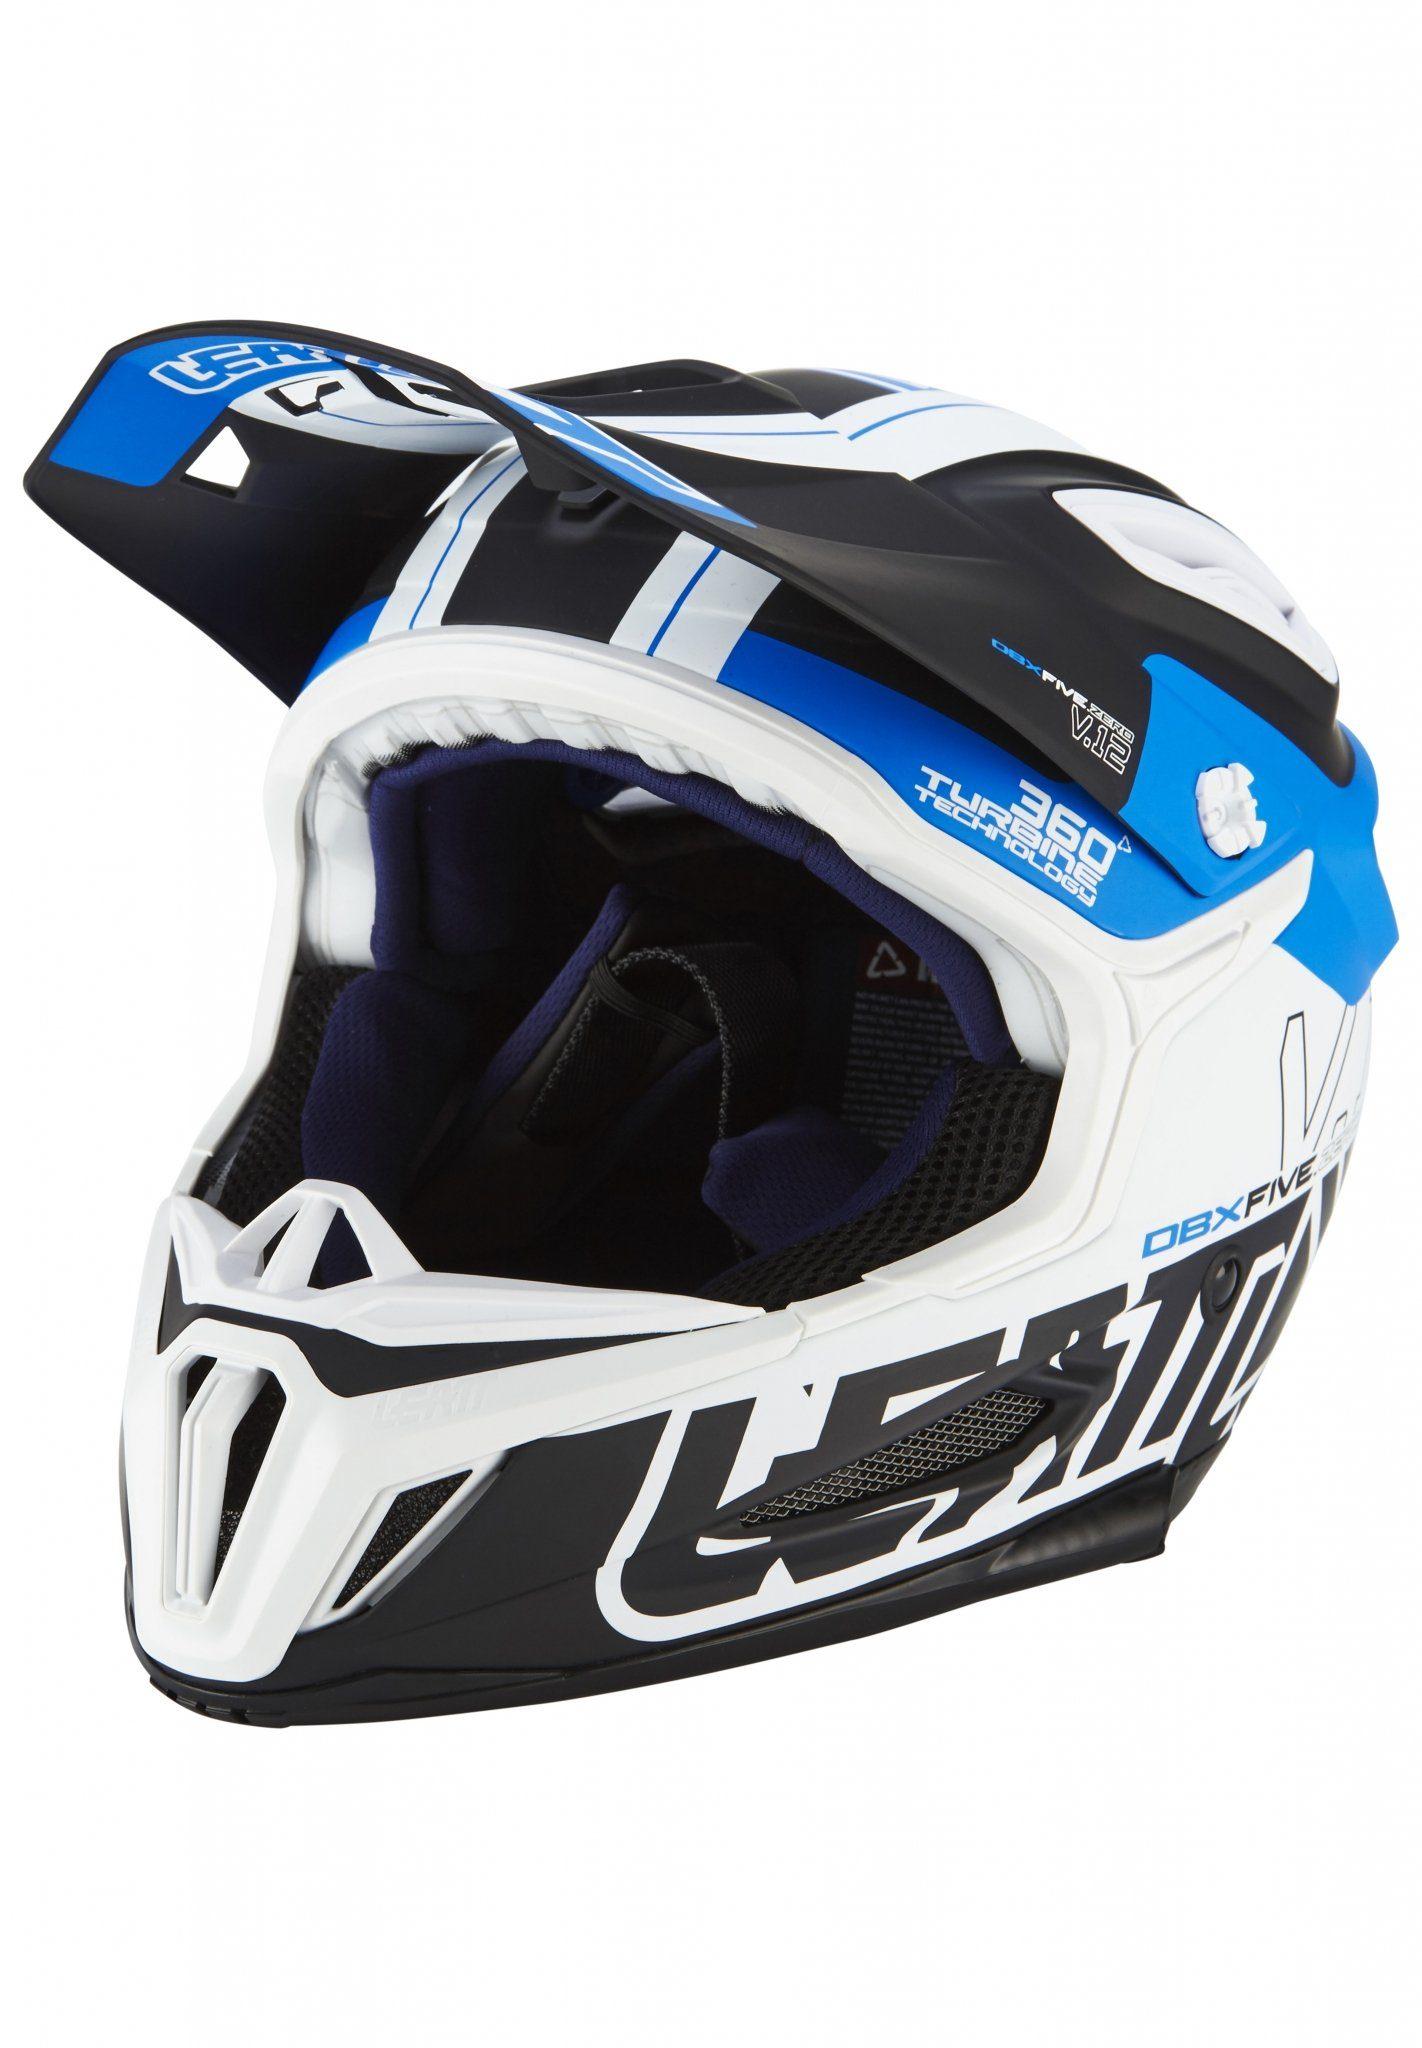 Leatt Brace Fahrradhelm »DBX 5.0 Composite Helmet«